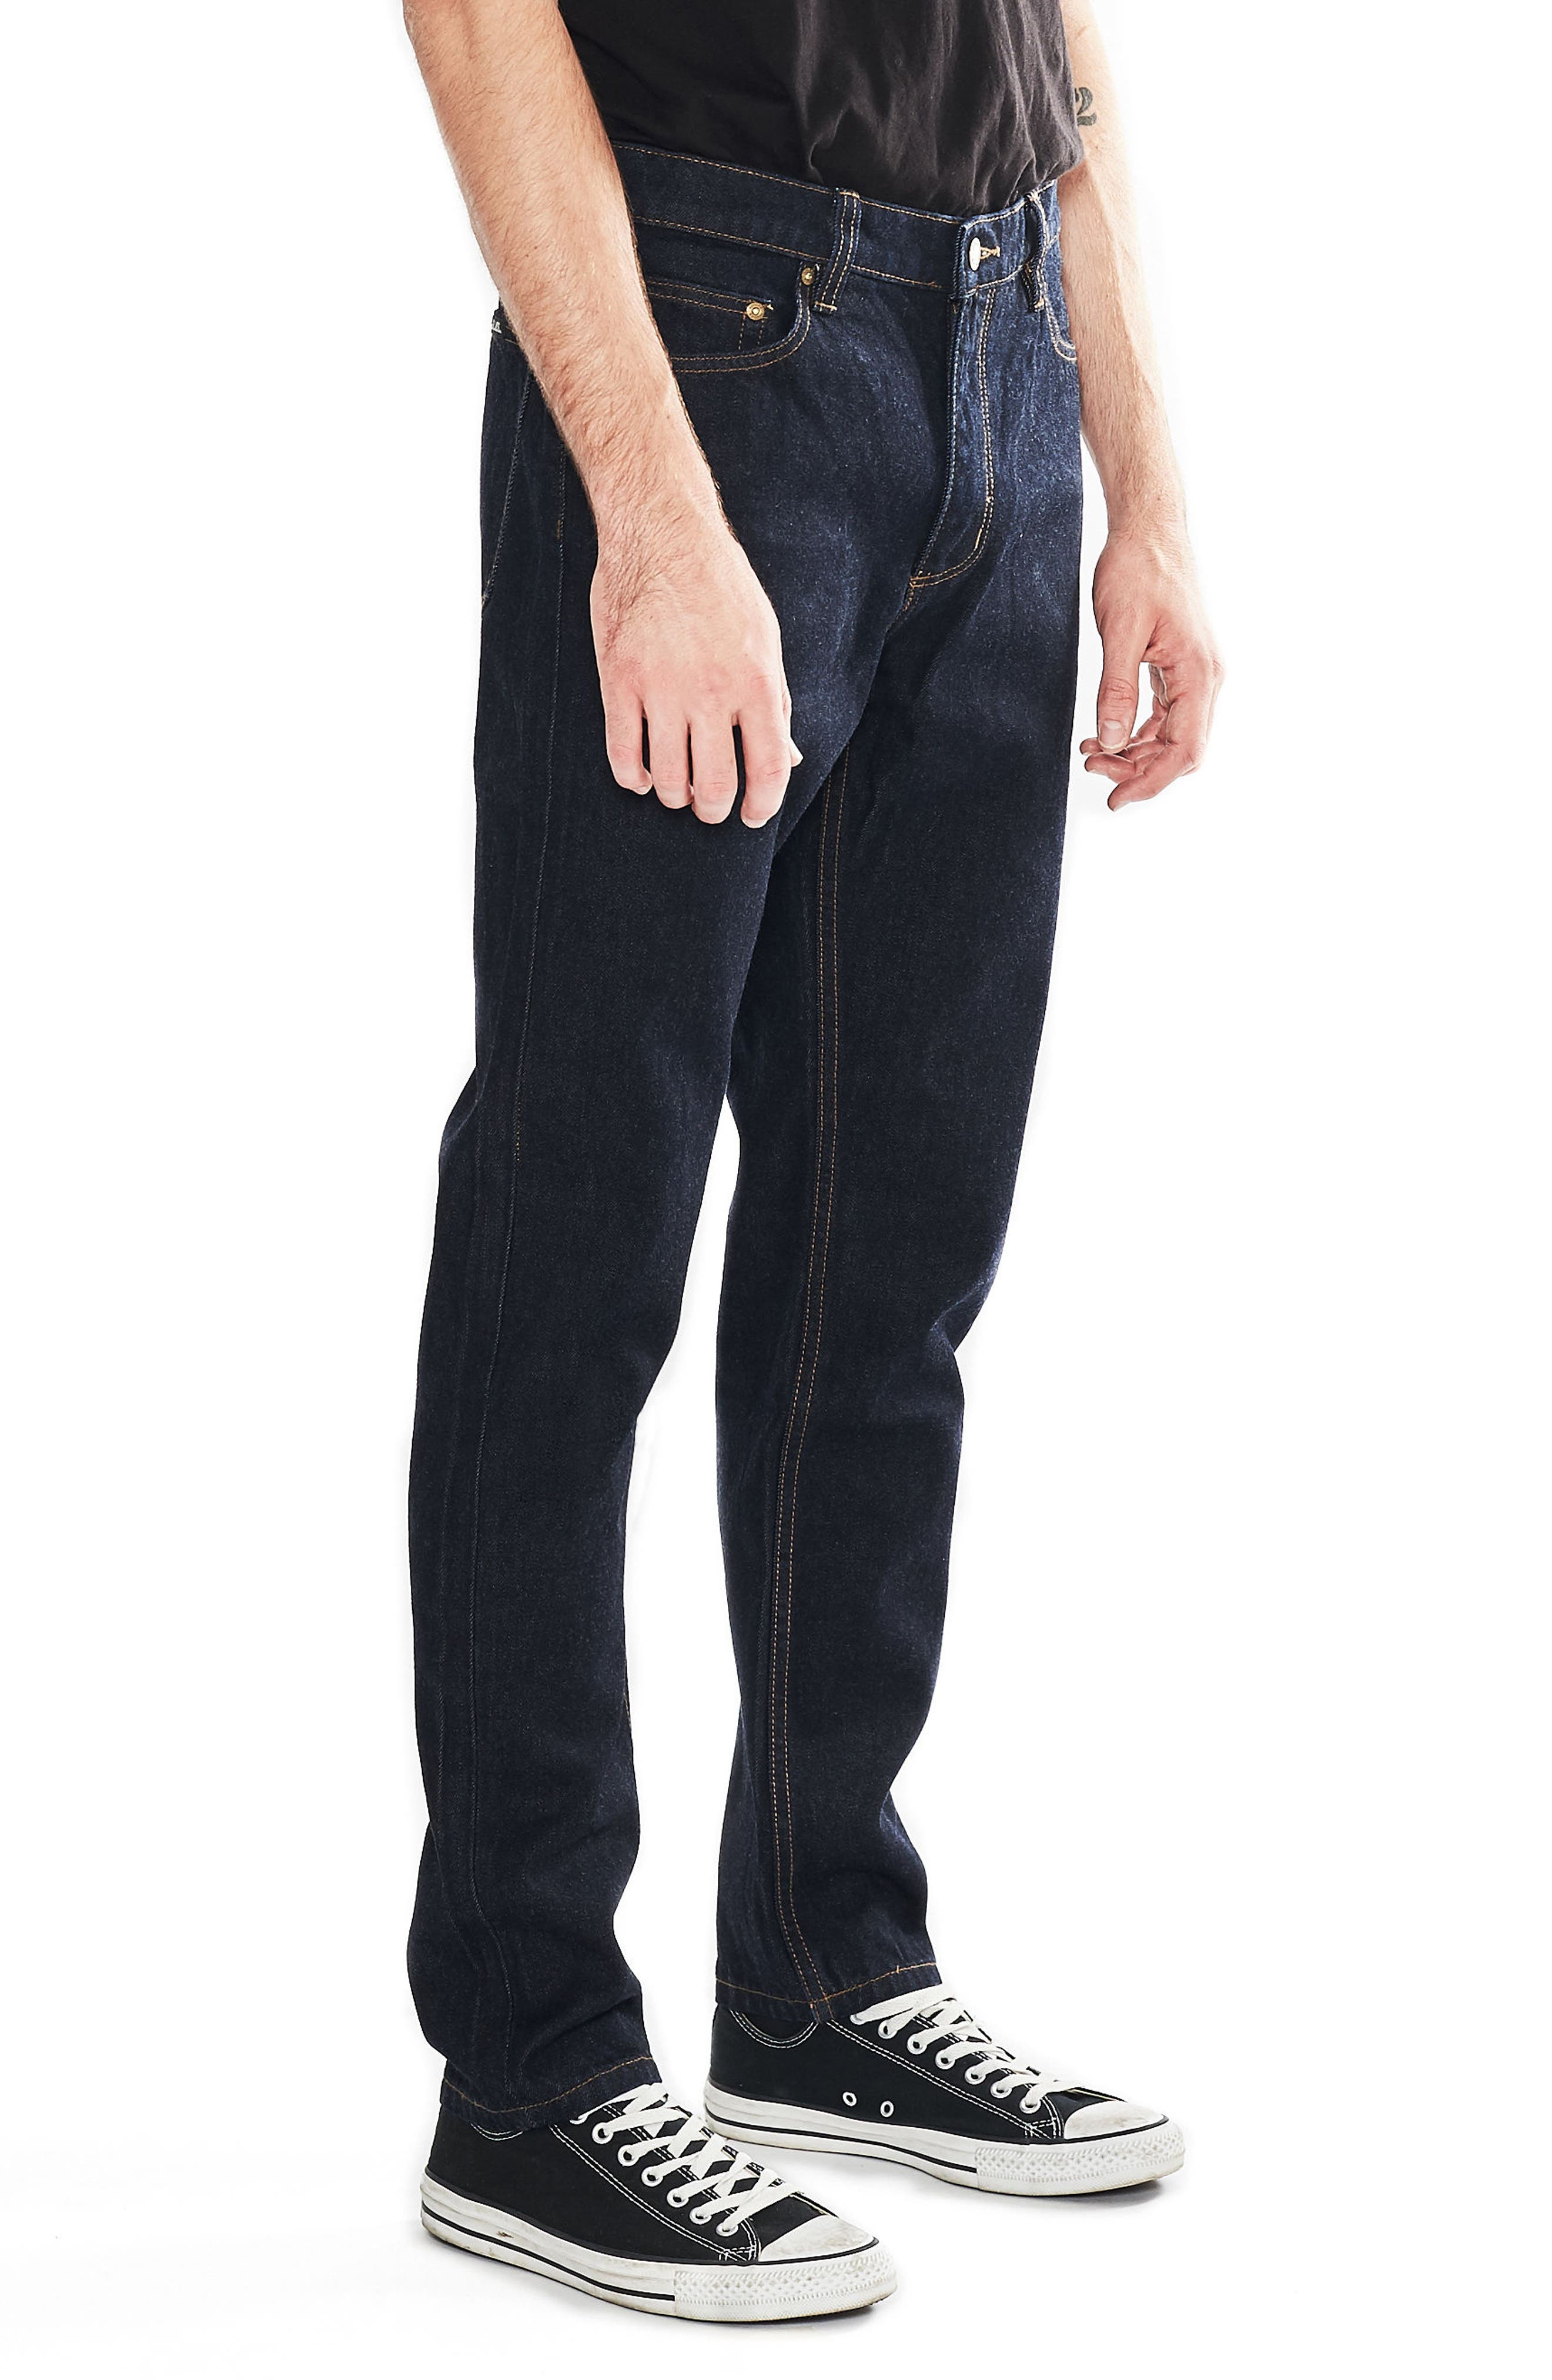 Tim Slims Slim Fit Jeans,                             Alternate thumbnail 3, color,                             Indigo Raw